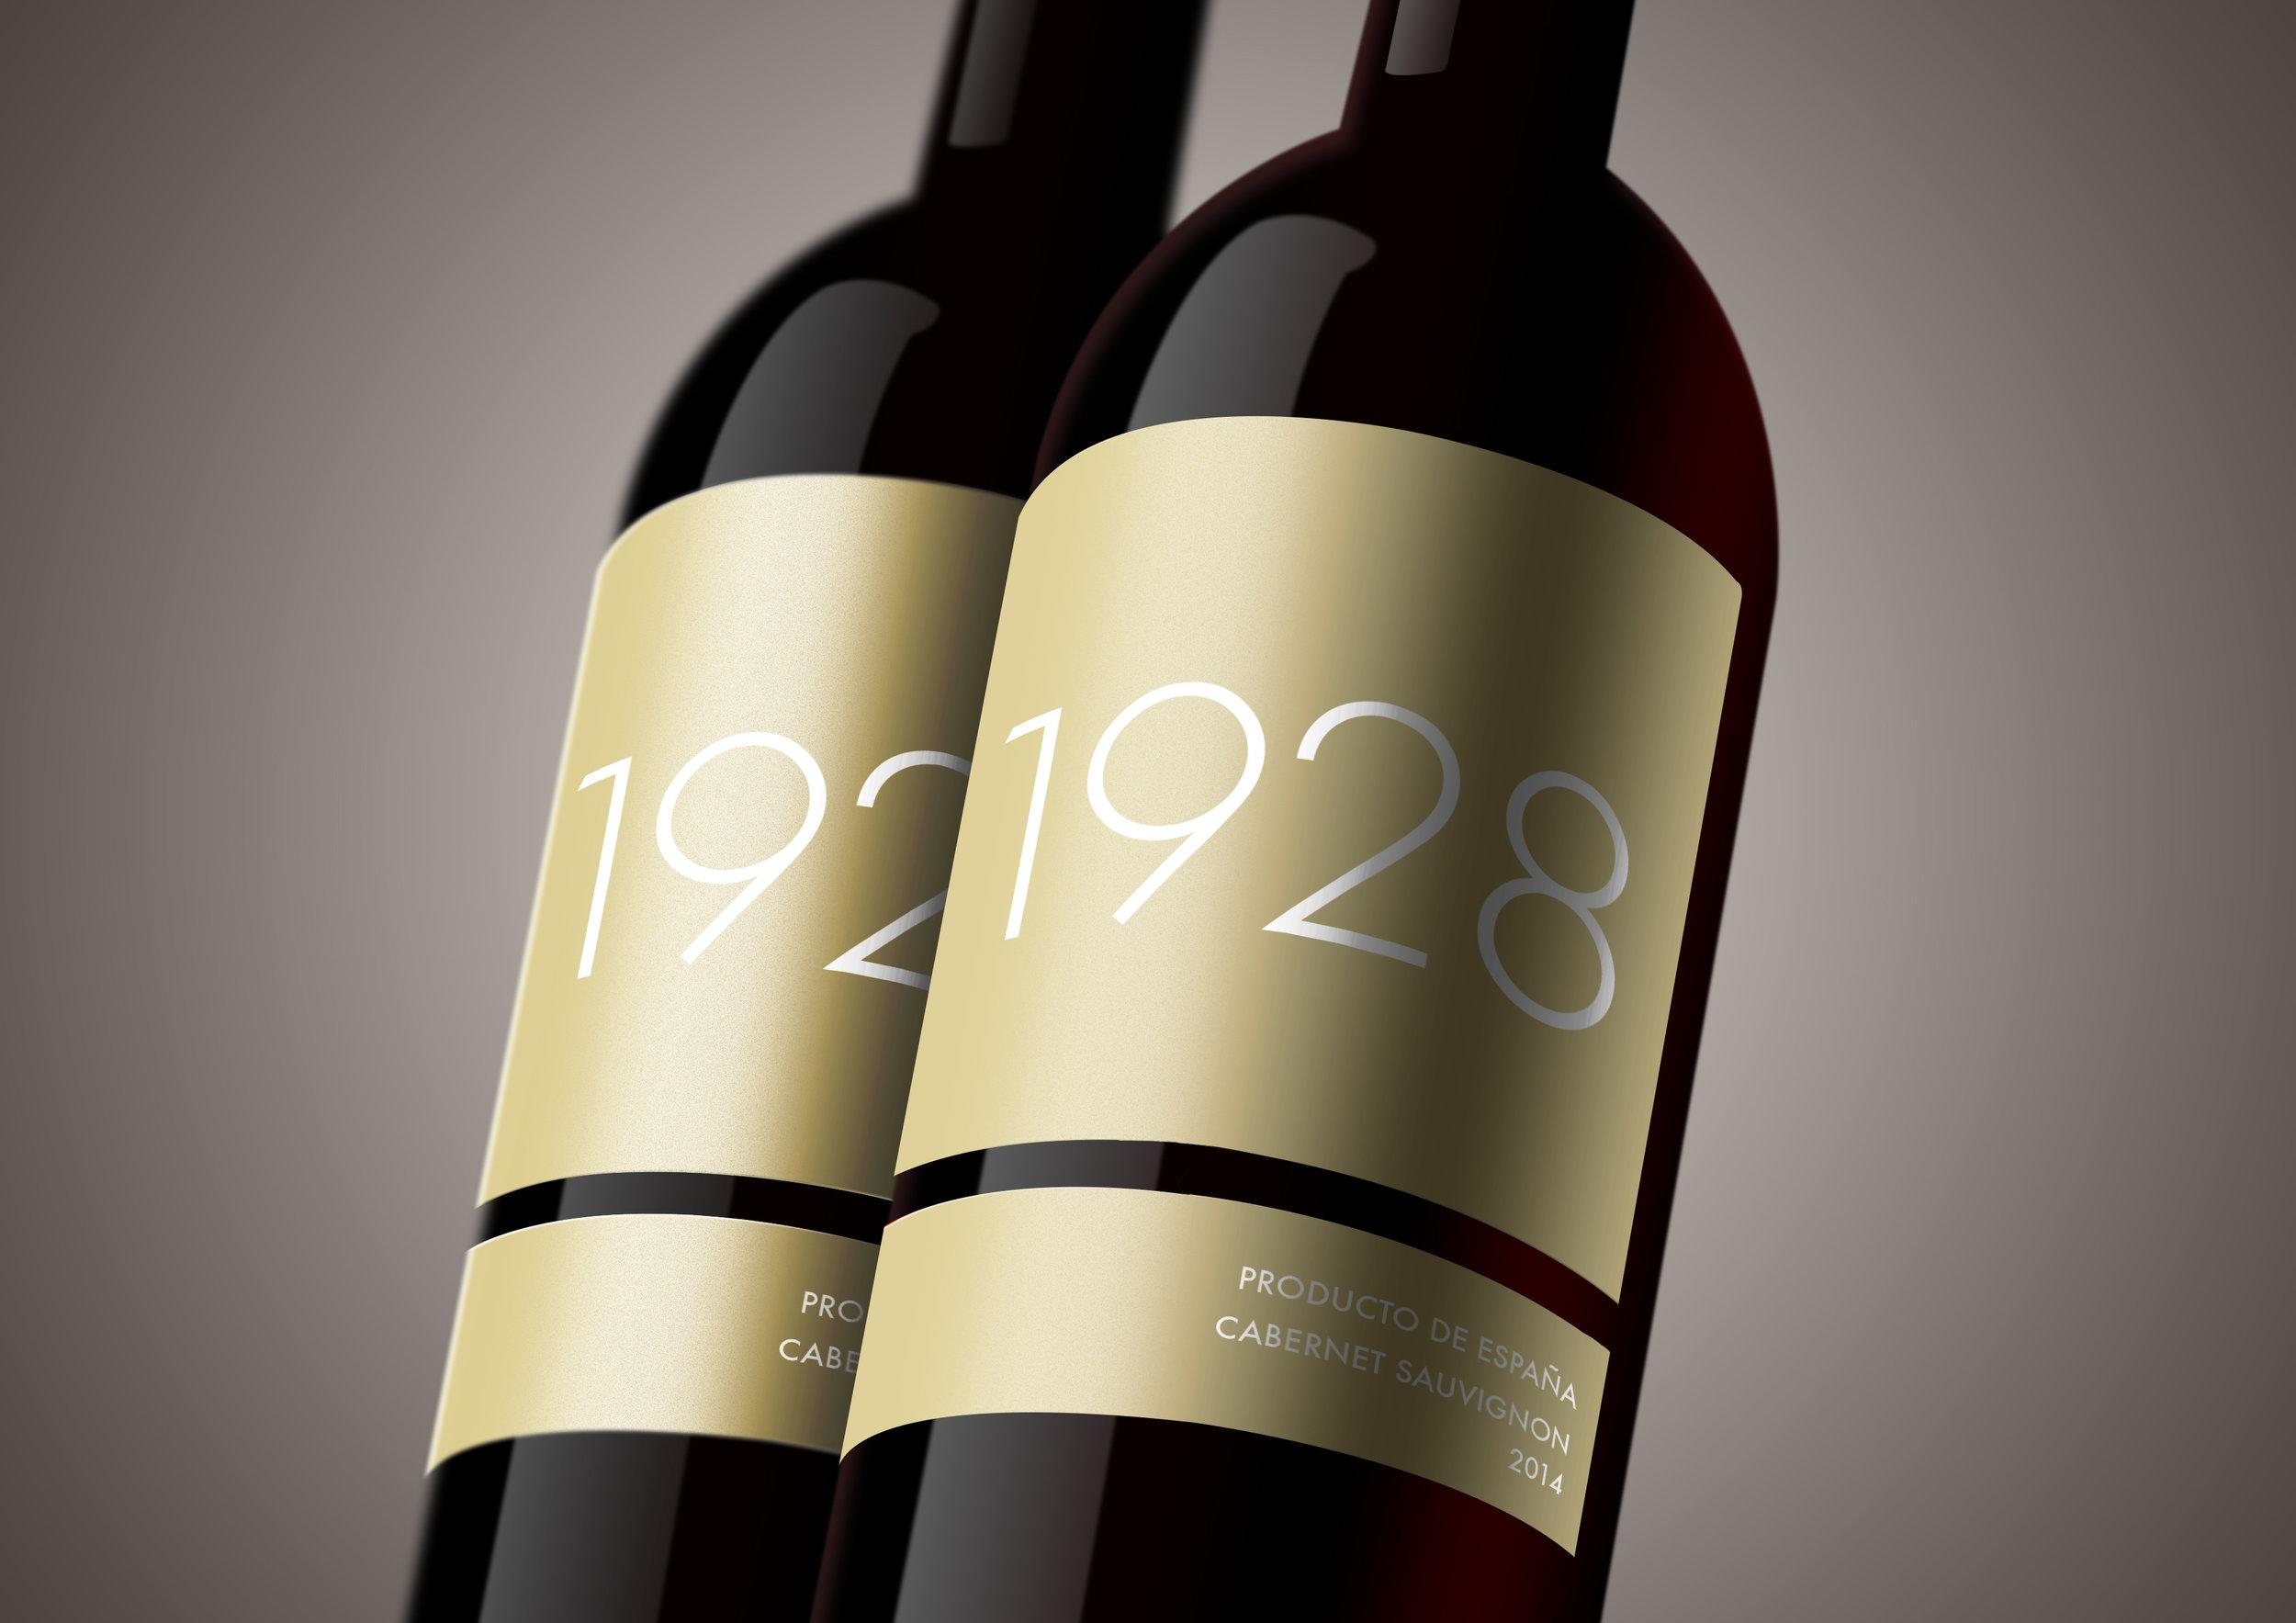 1928 Label 2 bottle shot.jpg